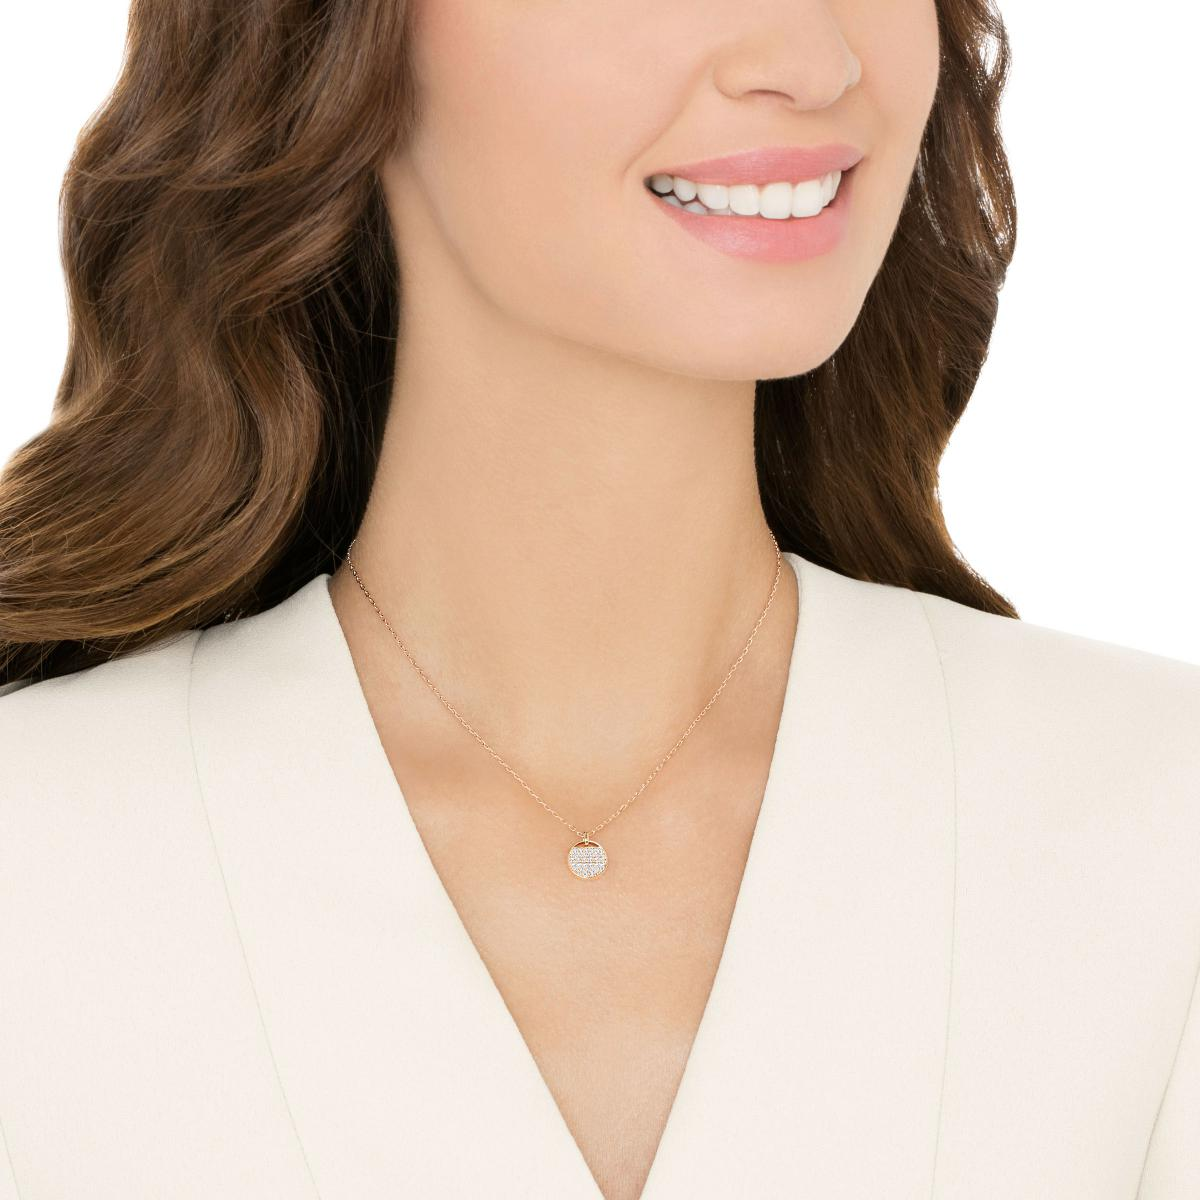 Collier et pendentif Swarovski Bijoux 5265913 - Plaque Or rose Femme